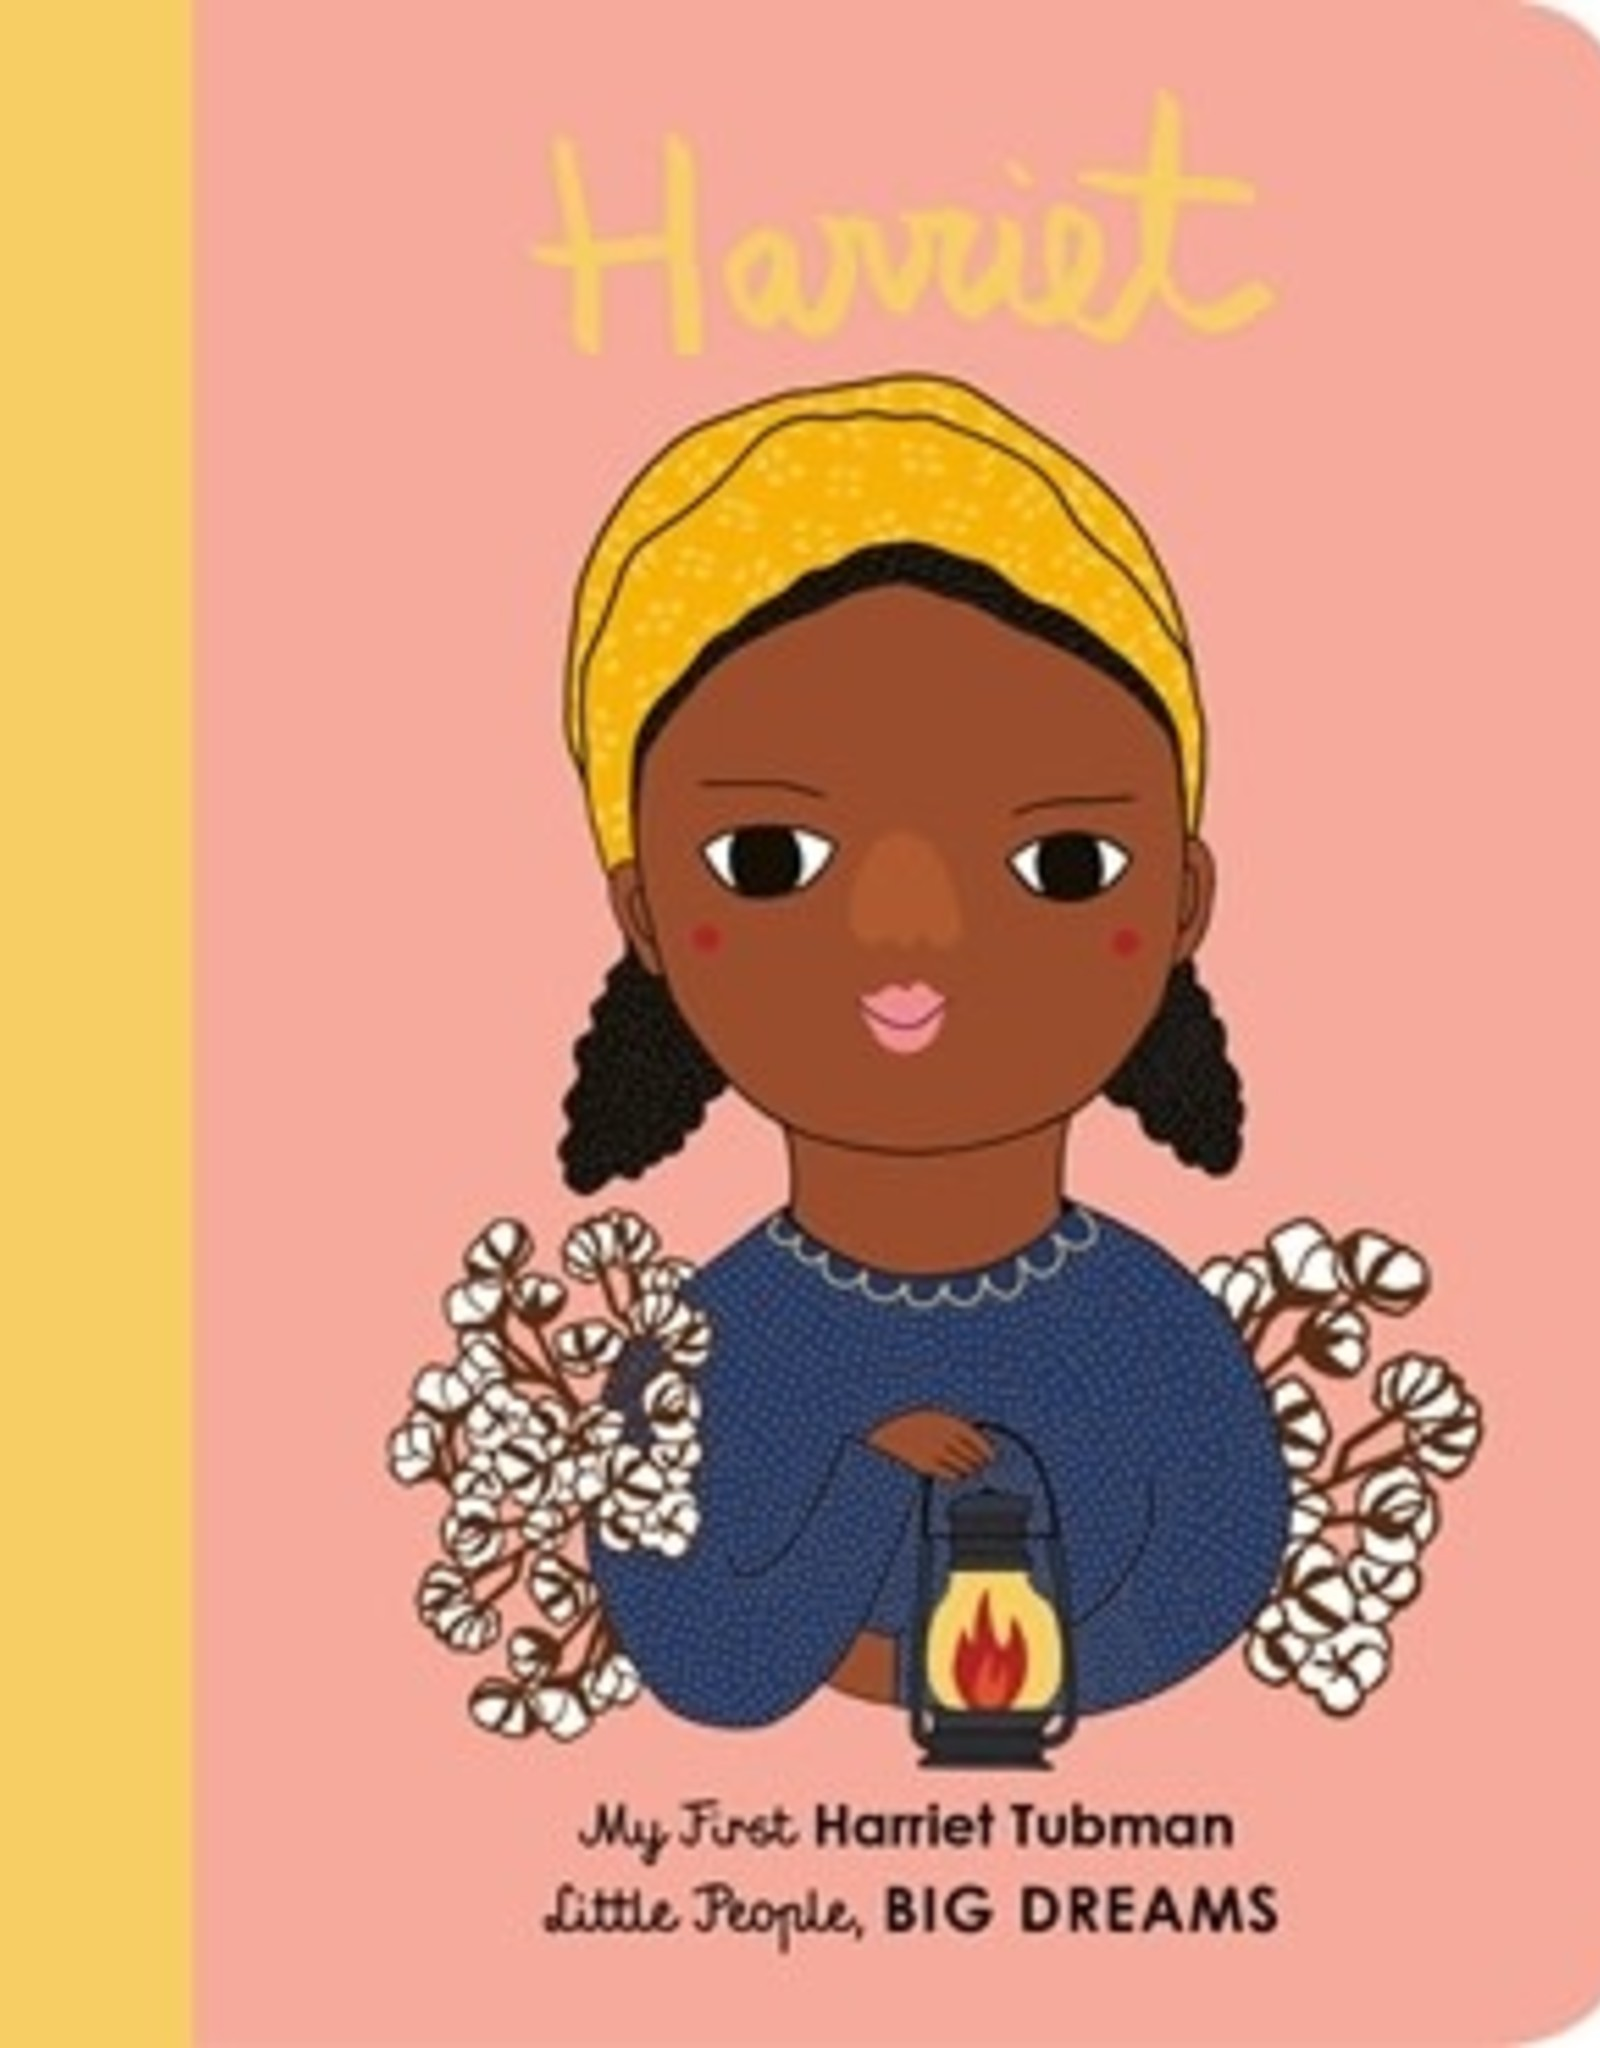 My First Harriet Tubman by Maria Isabel Sanchez Vegara and Pili Aguado